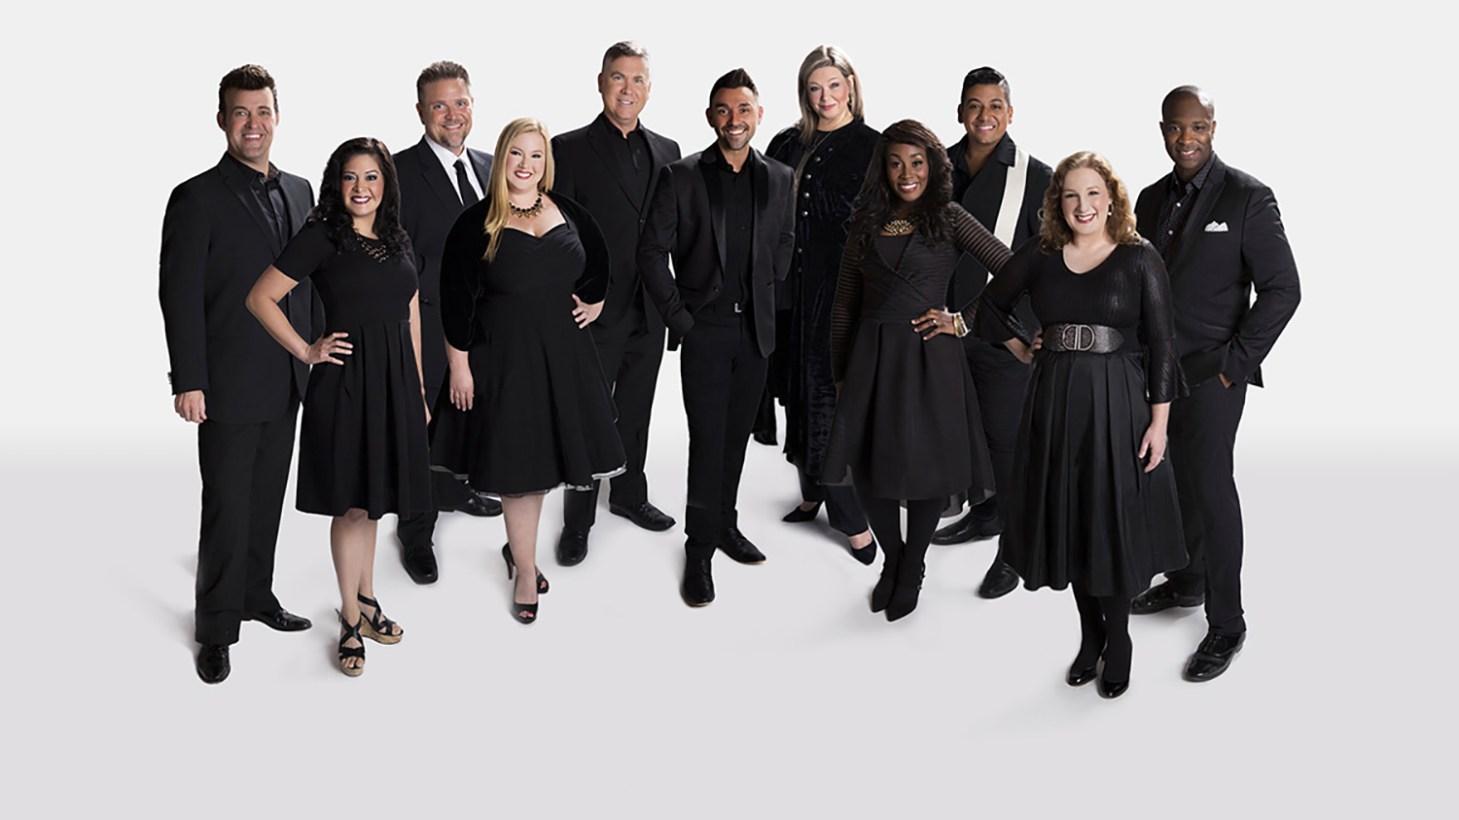 The Philharmonic Society Of Orange County's 2019-2020 Season